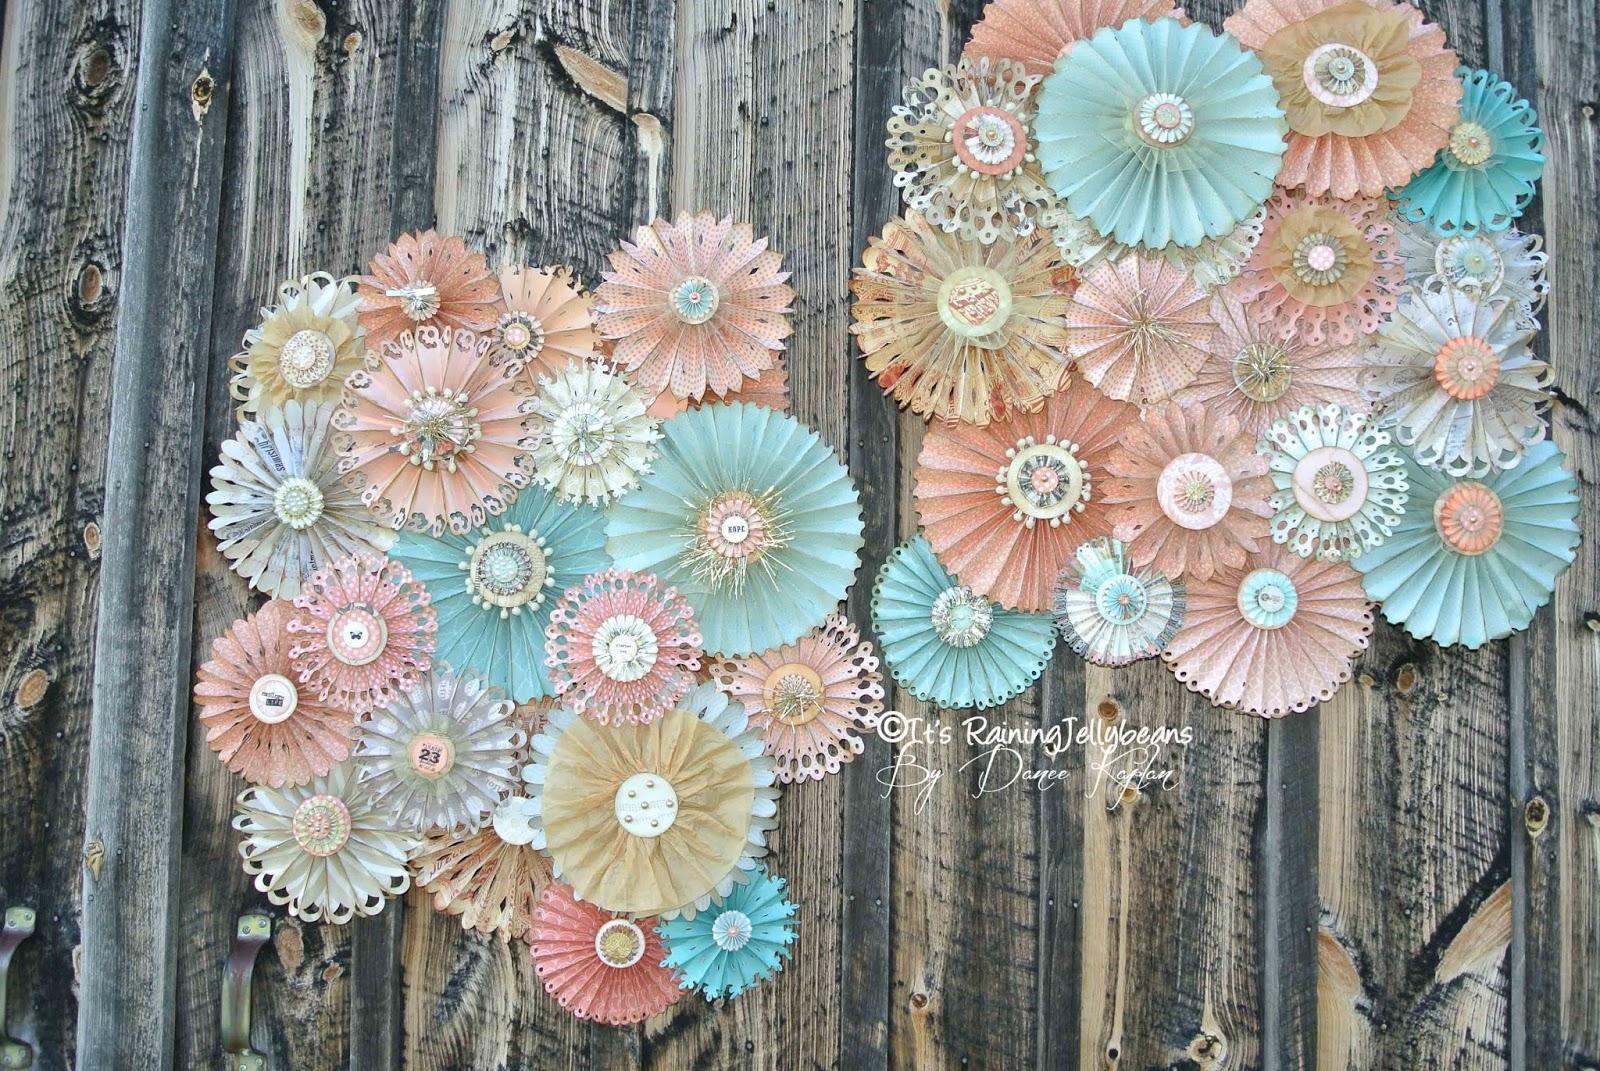 It S Raining Jellybeans Wedding Rosette Wall Decor